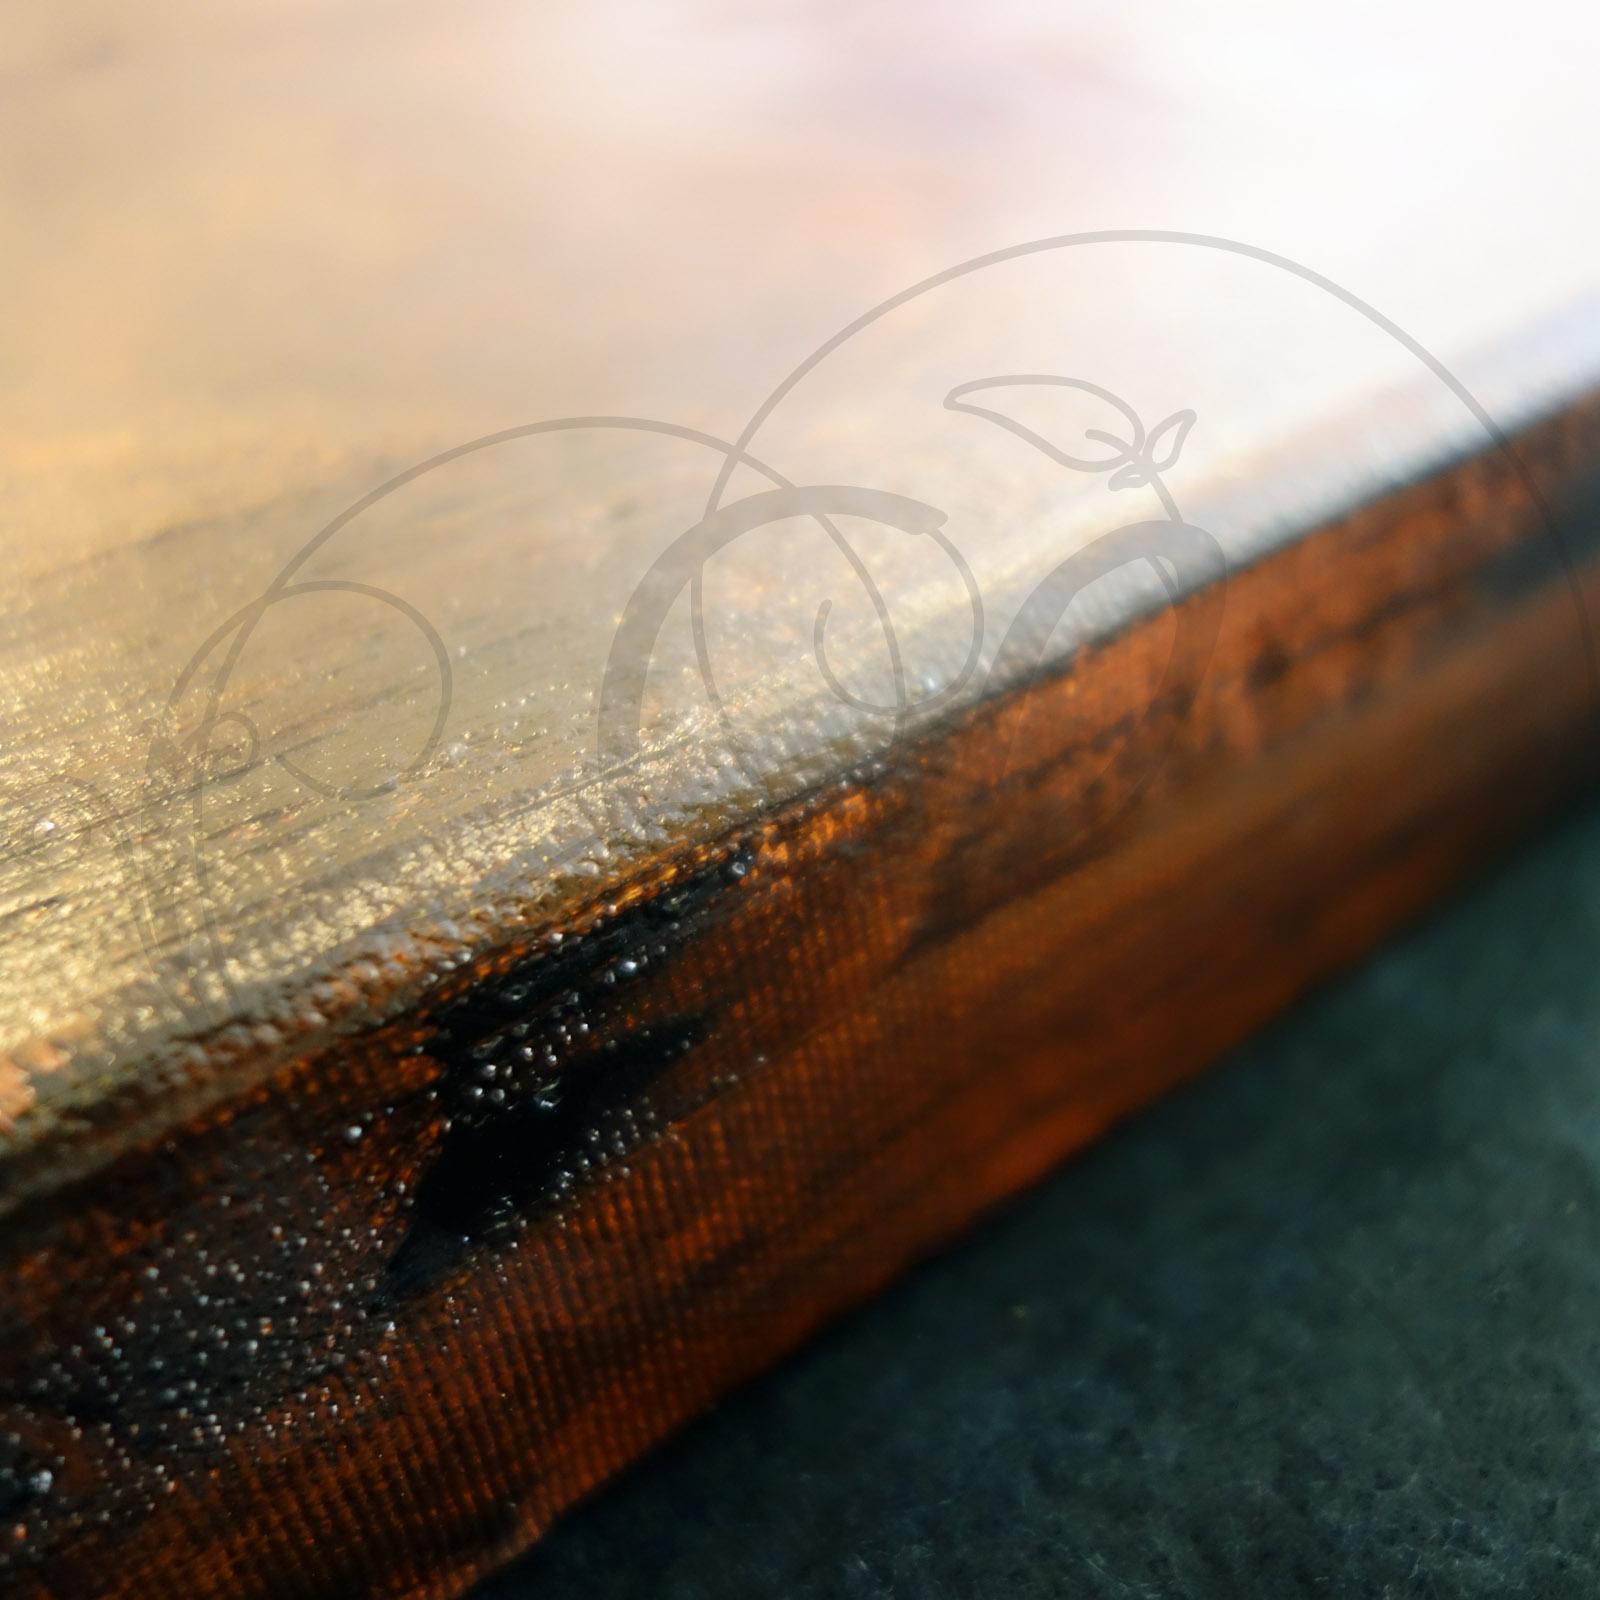 peinture-originale-lignes-vivantes-n1-julian-08